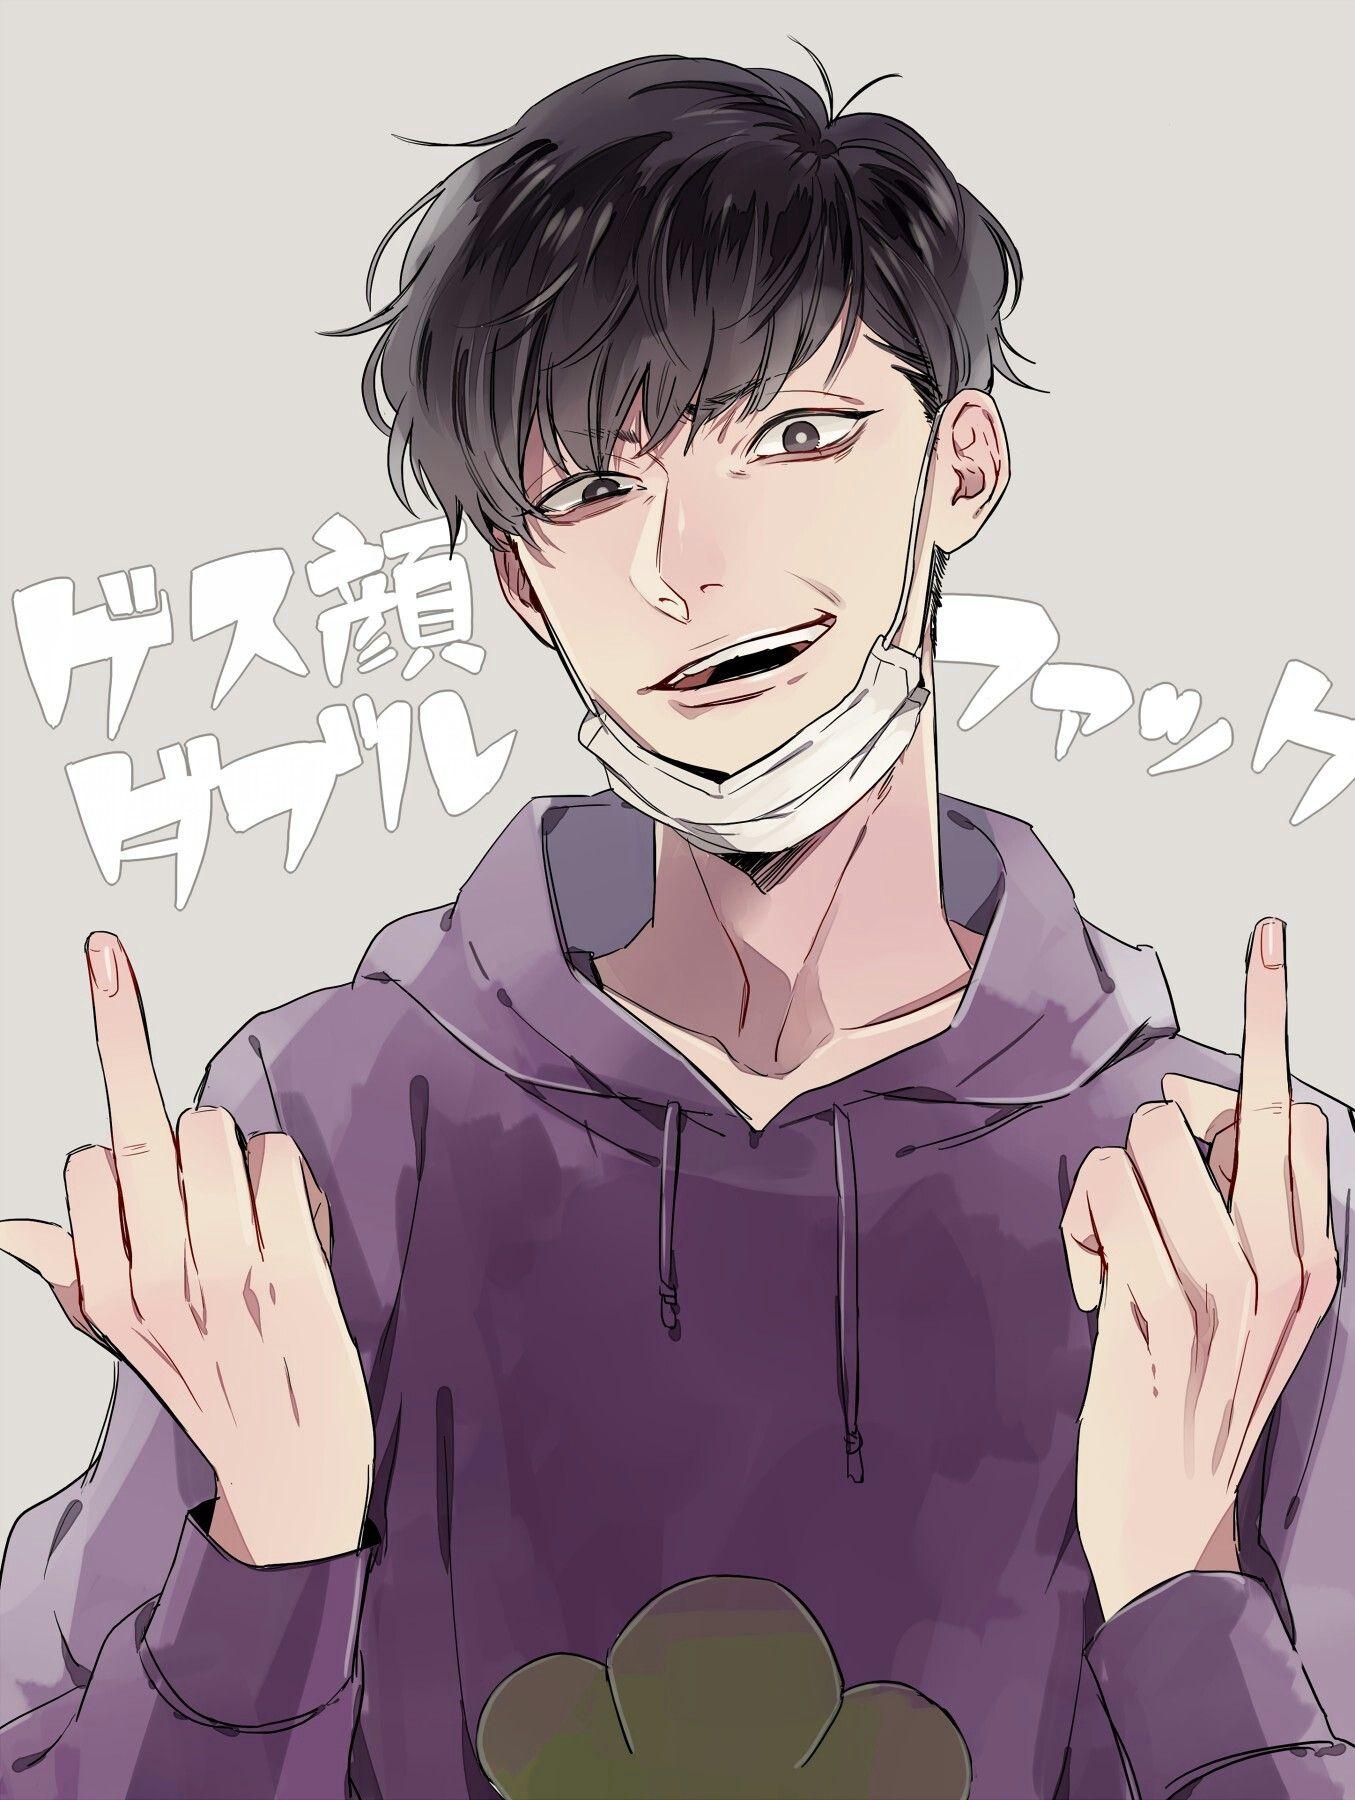 Bunny Nova S Hairstyle Anime Anime Boy Manga Boy